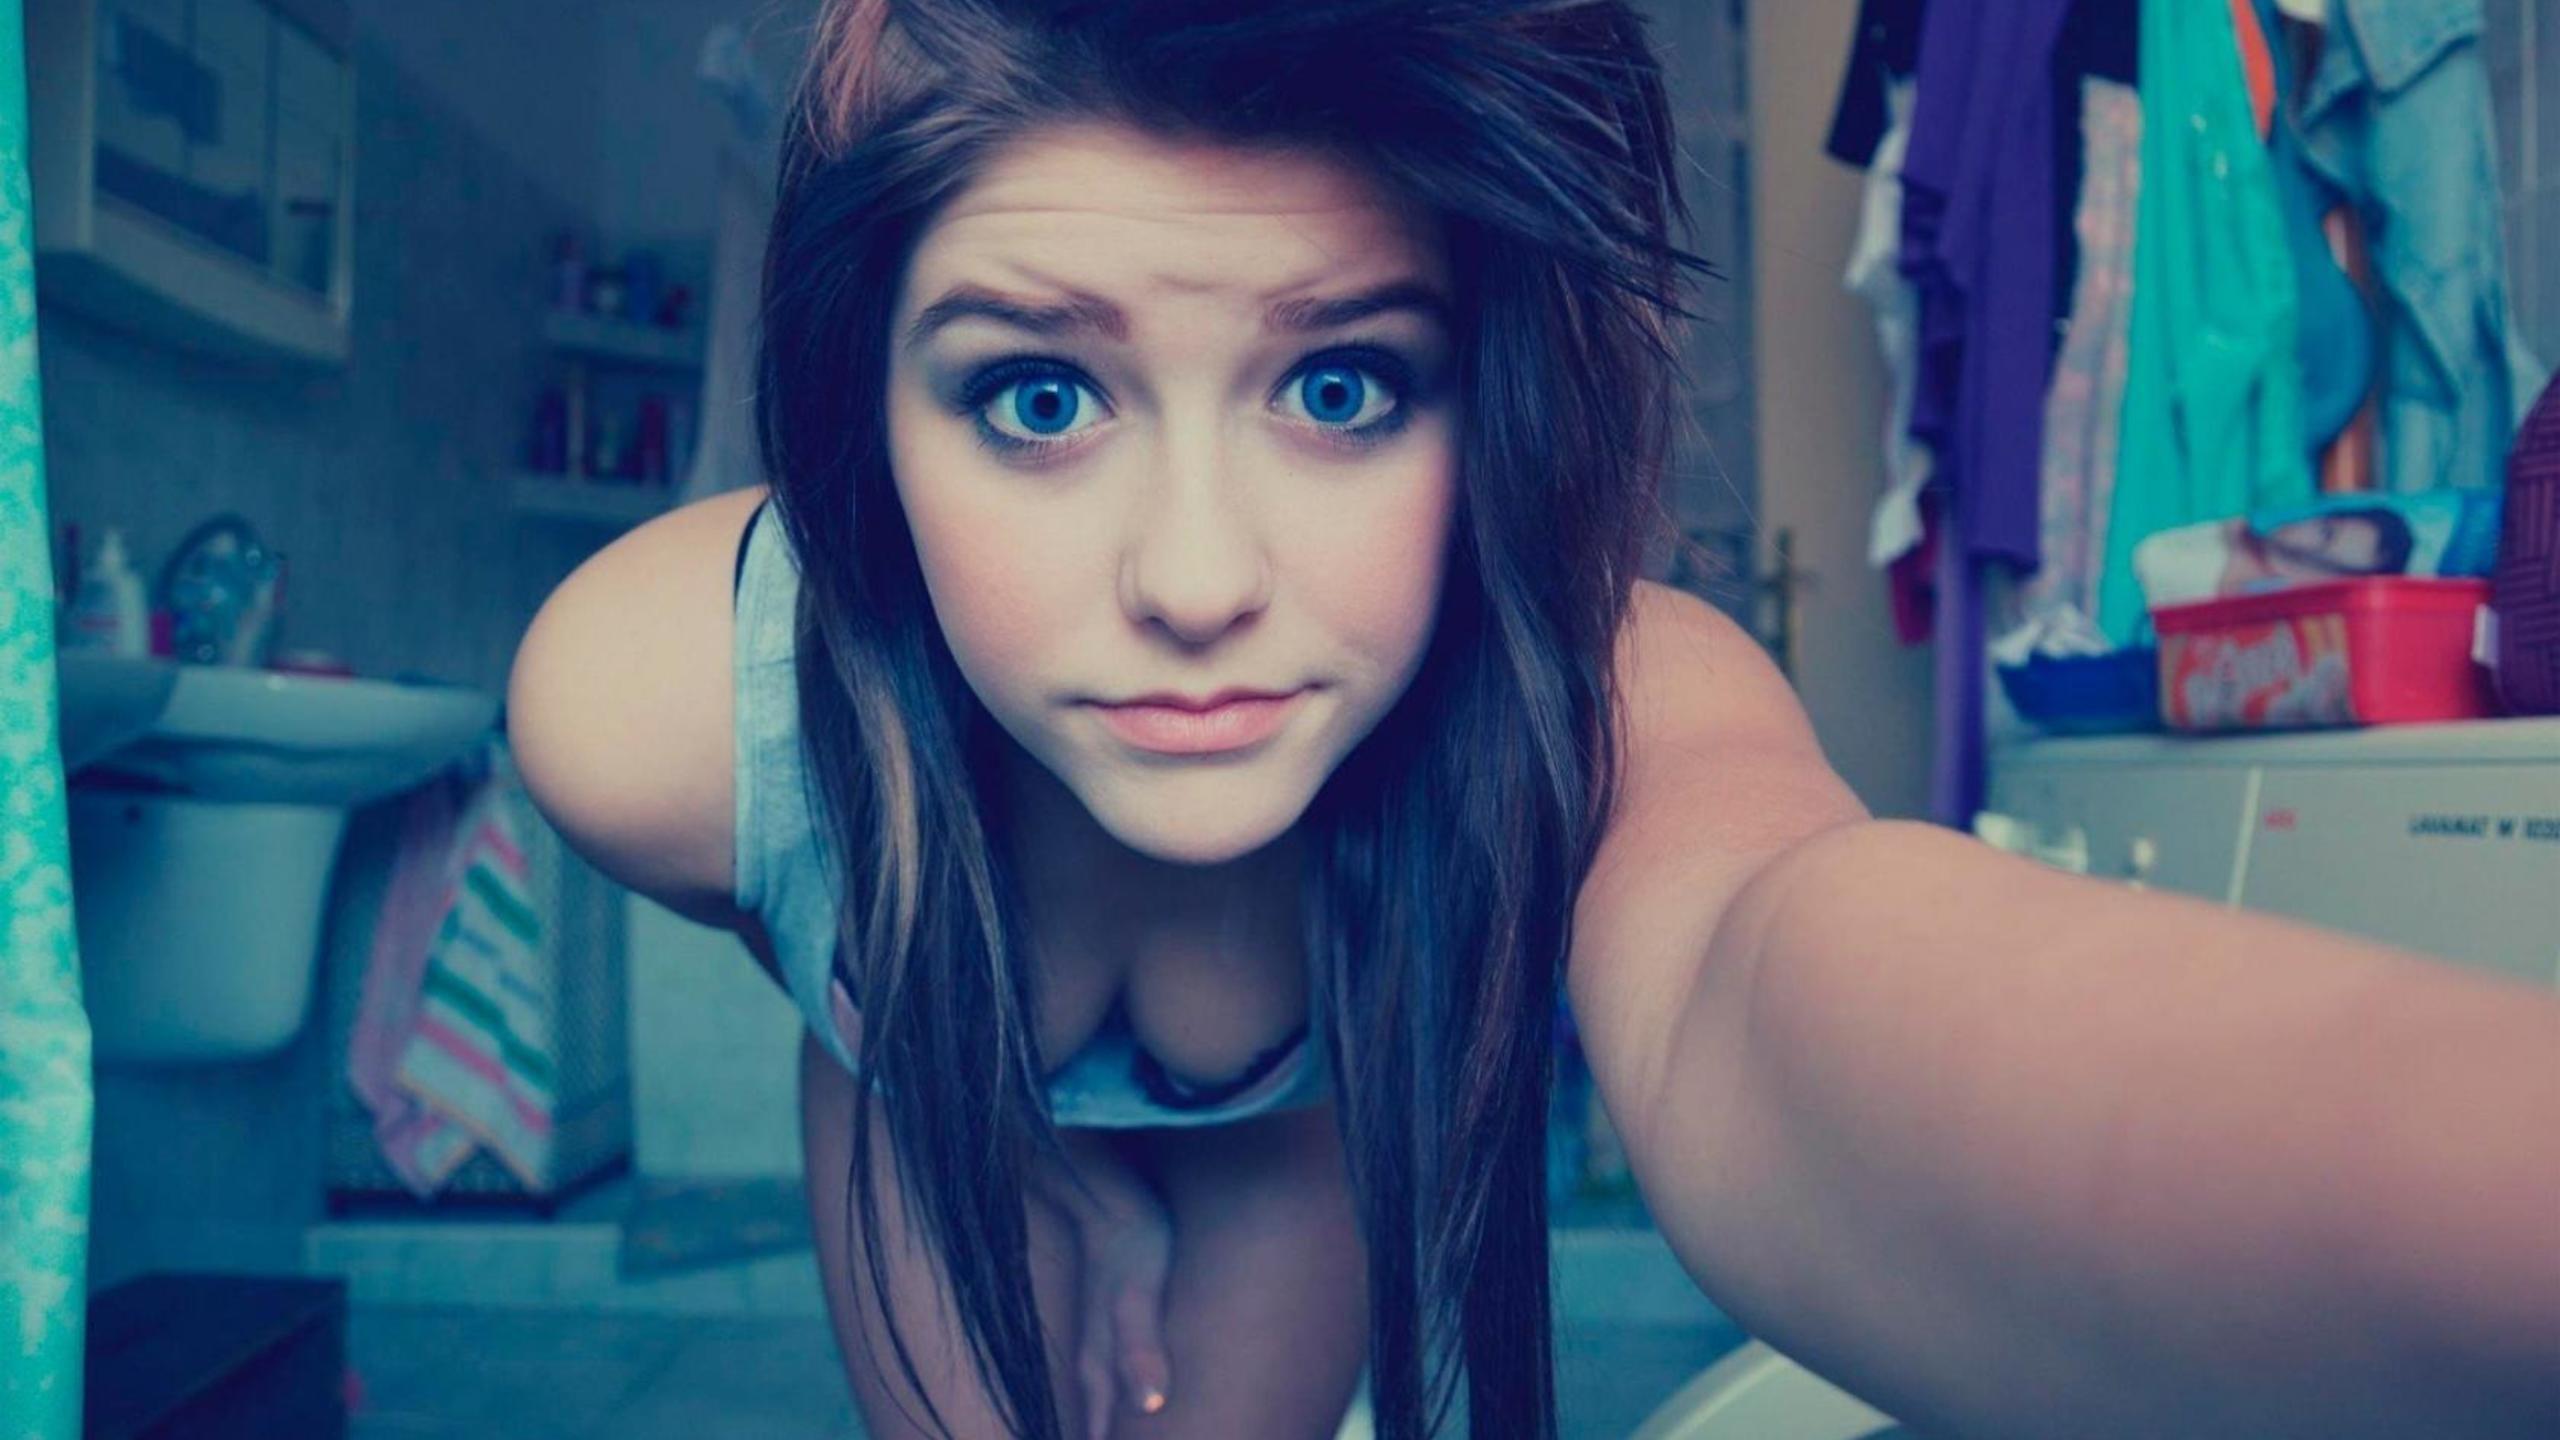 blue-eyes-cute-teen-girl-on.jpg